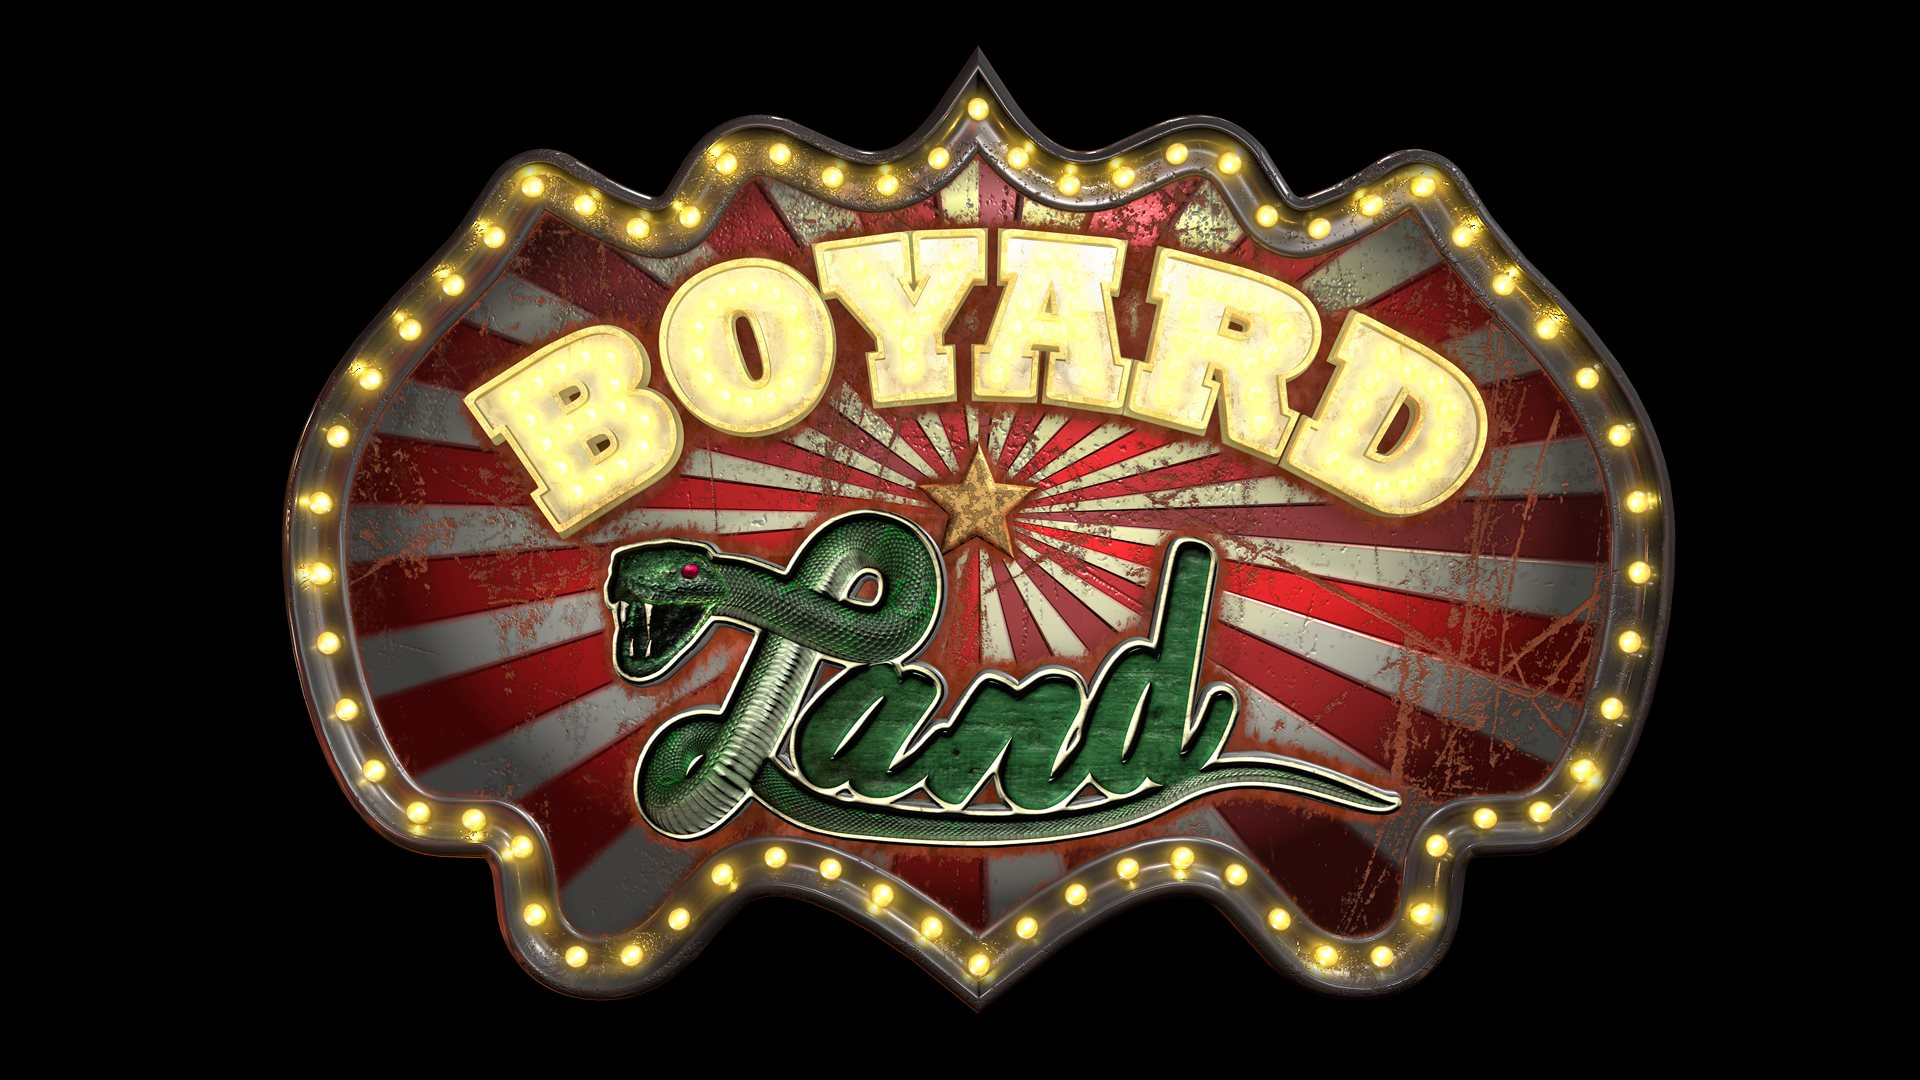 Boyard Land - France 2 - Audience